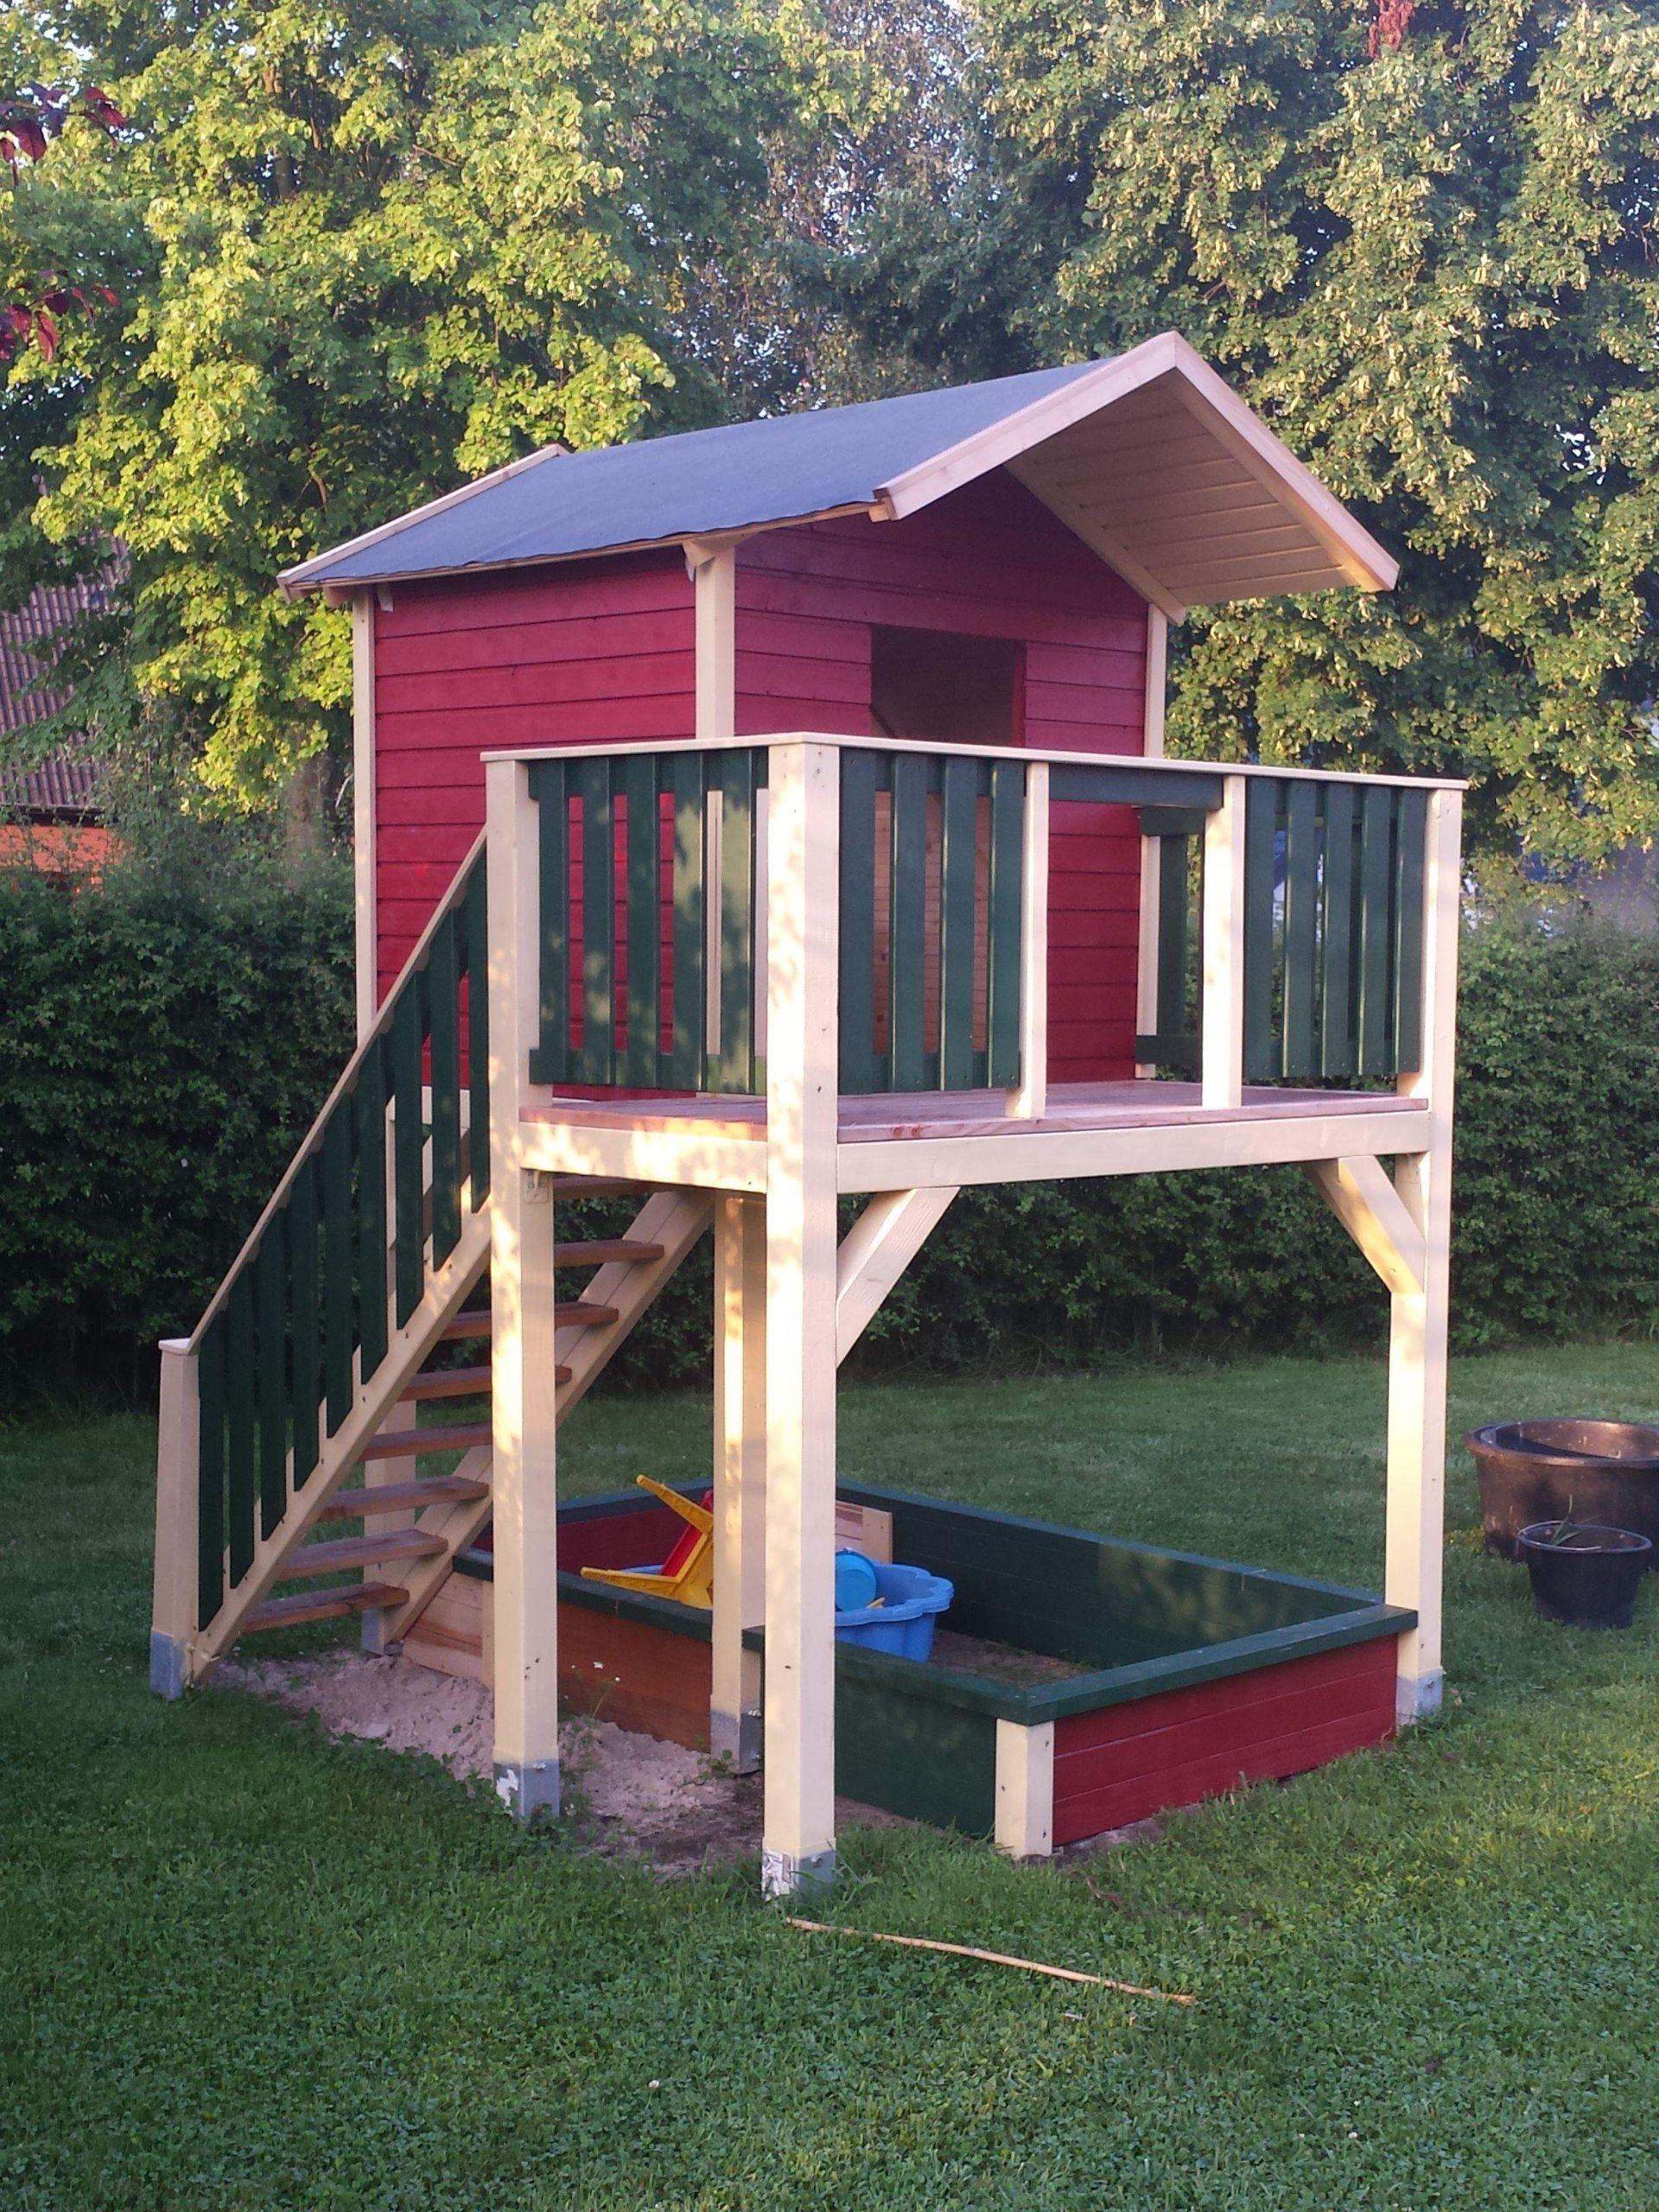 Spielhaus Garten Holz Inspirierend Spielturm Mit Treppe Bauanleitung Zum Selber Bauen